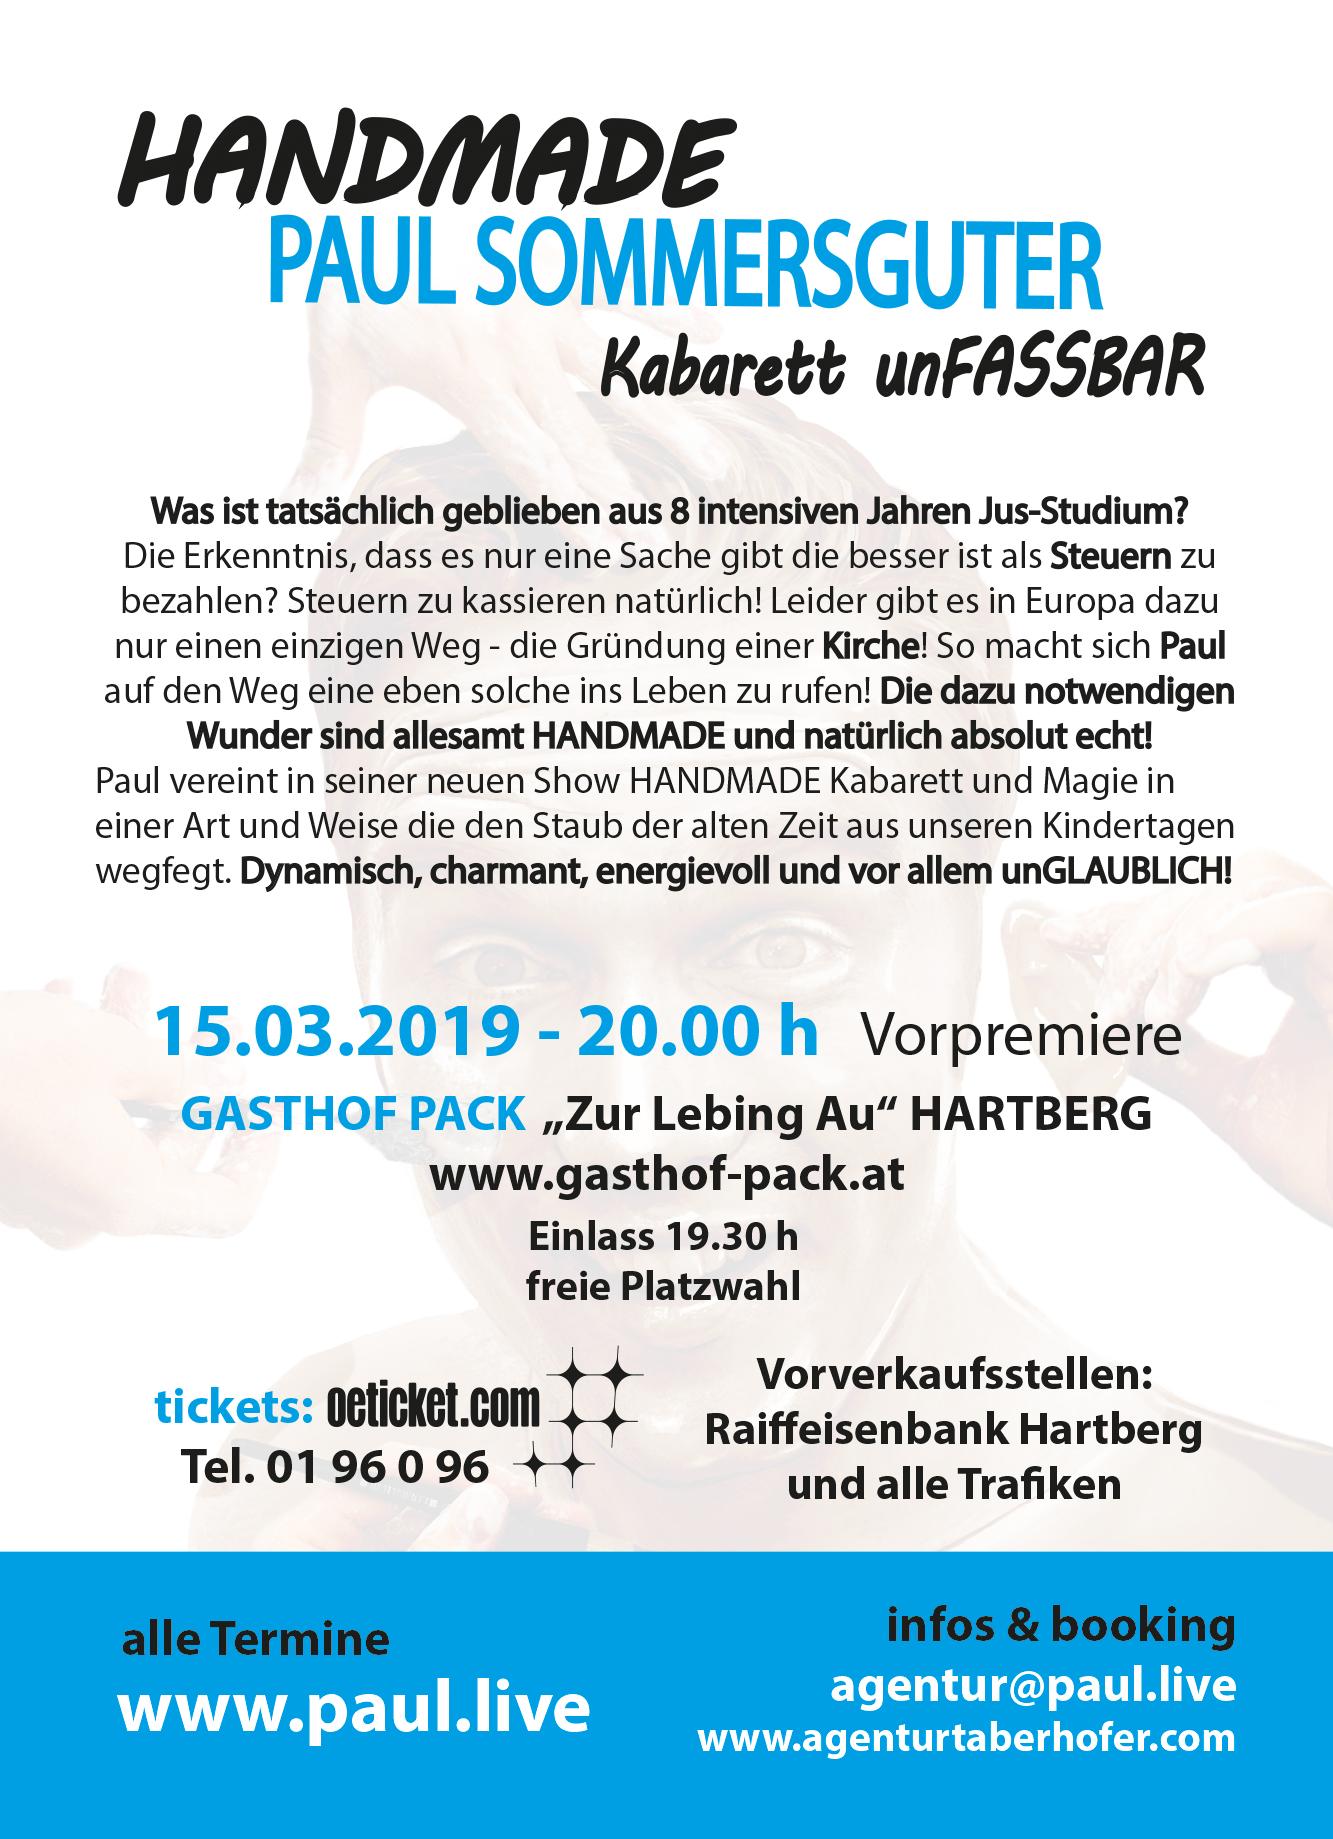 FlyerBackHandmade Paul Sommersguter